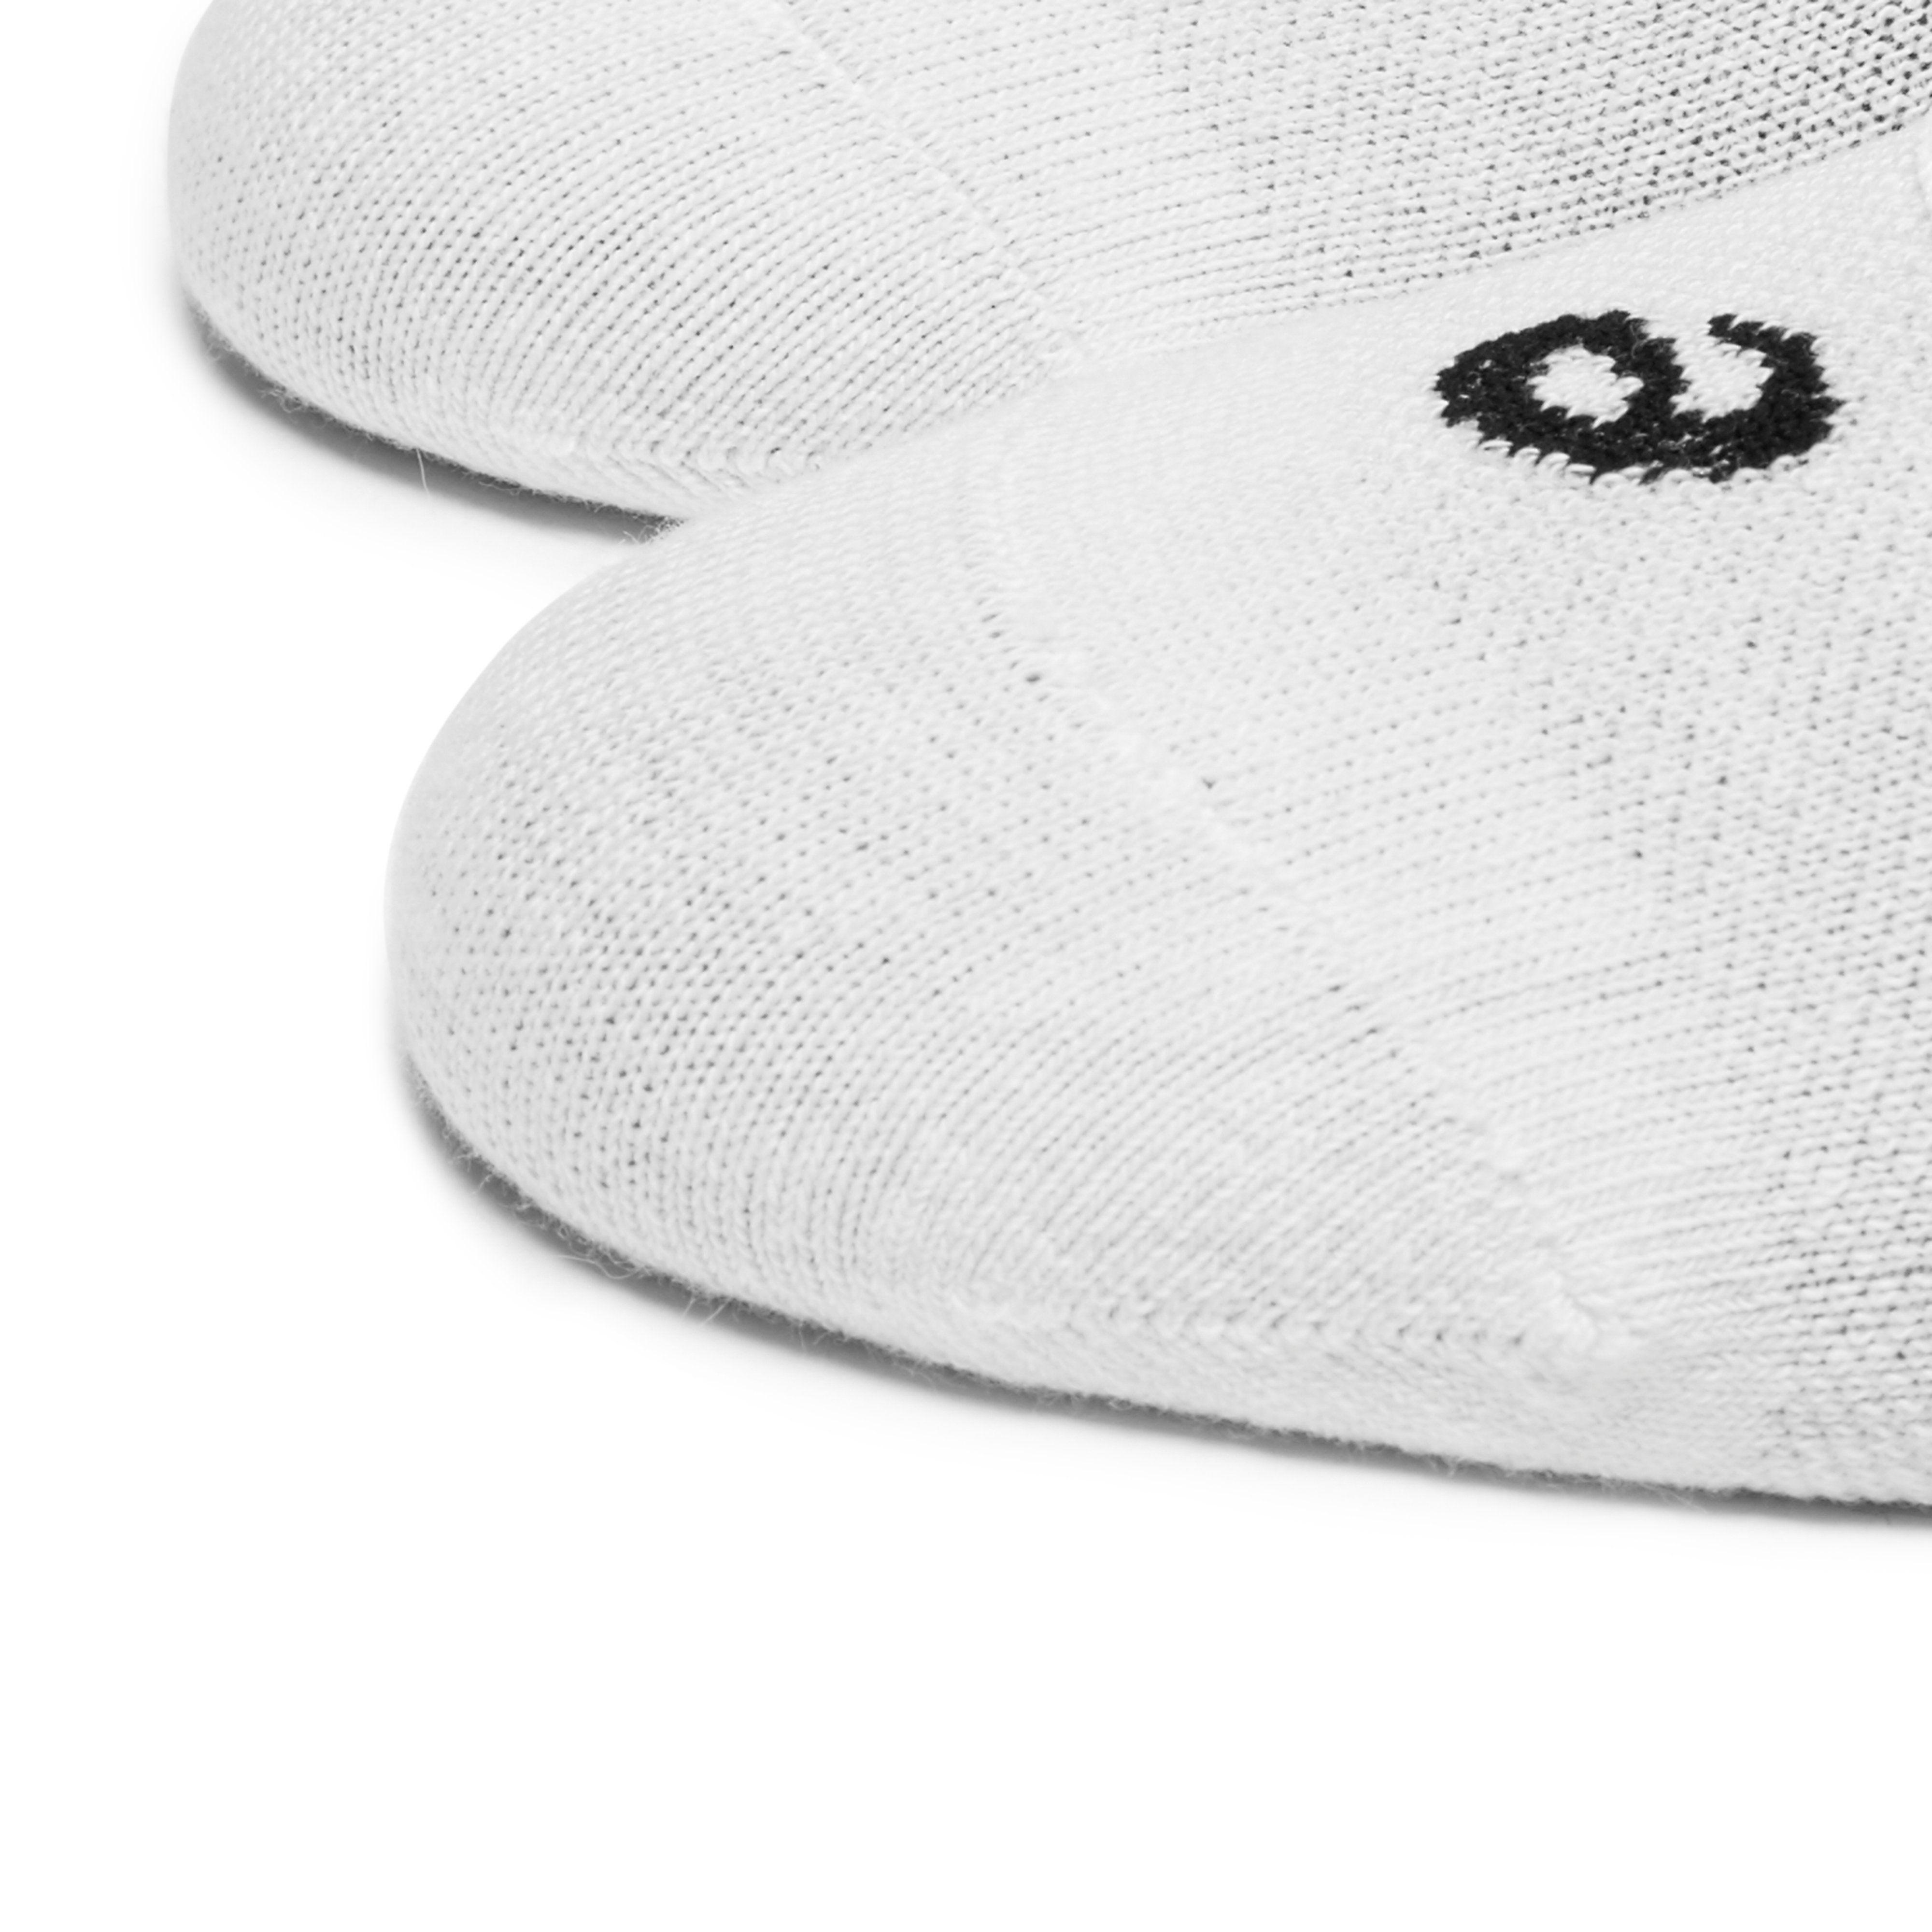 ASICS Secret Performance Socks (3 Pairs)